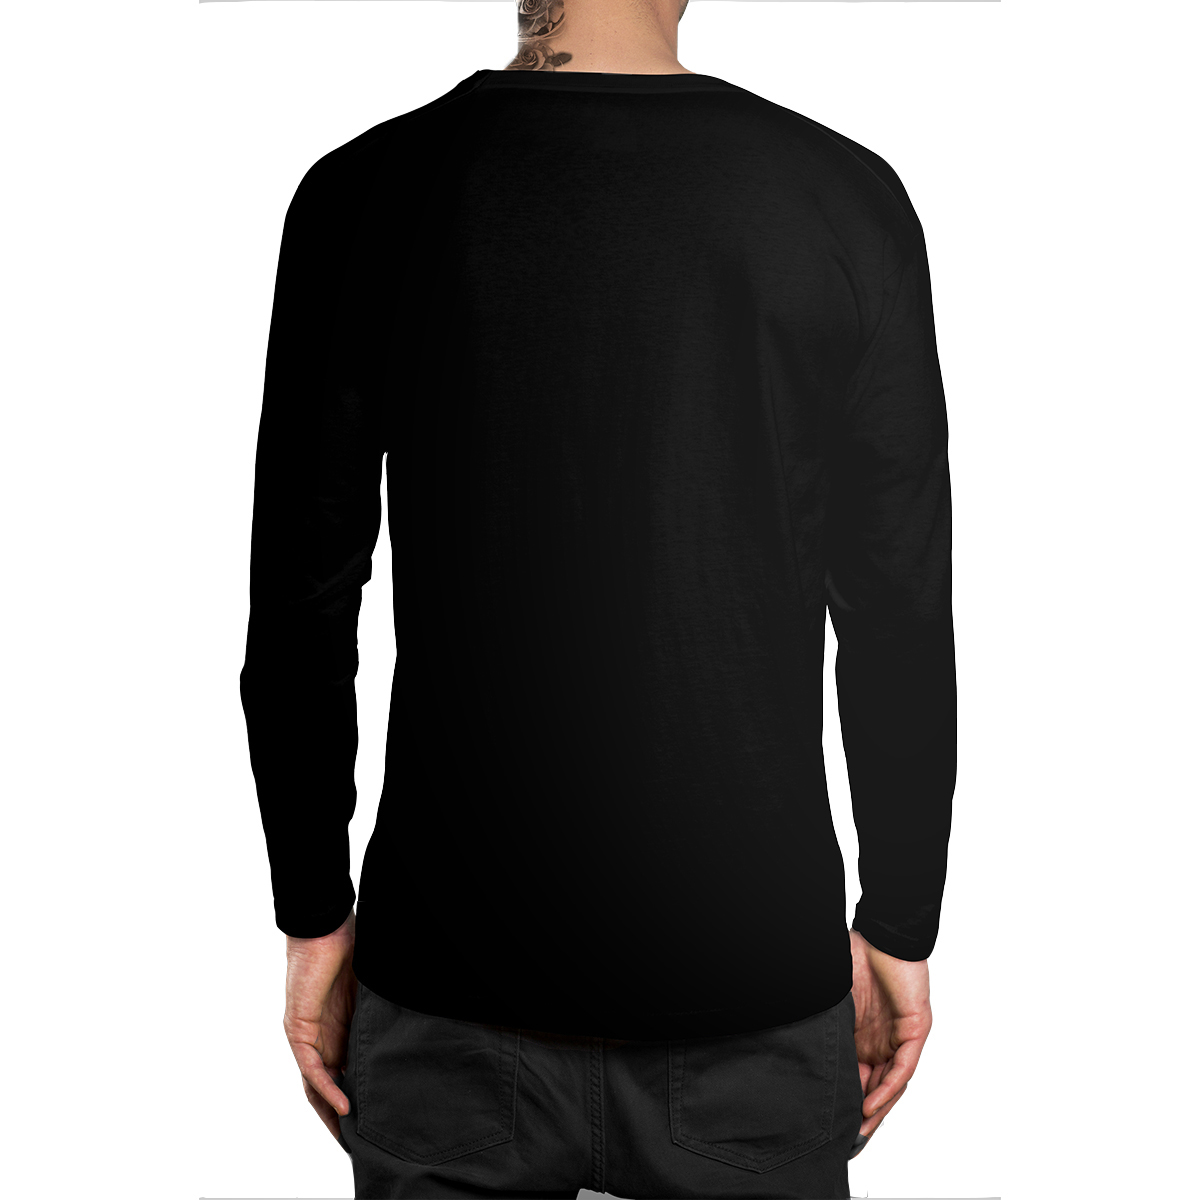 Stompy Camiseta Manga Longa Modelo 41